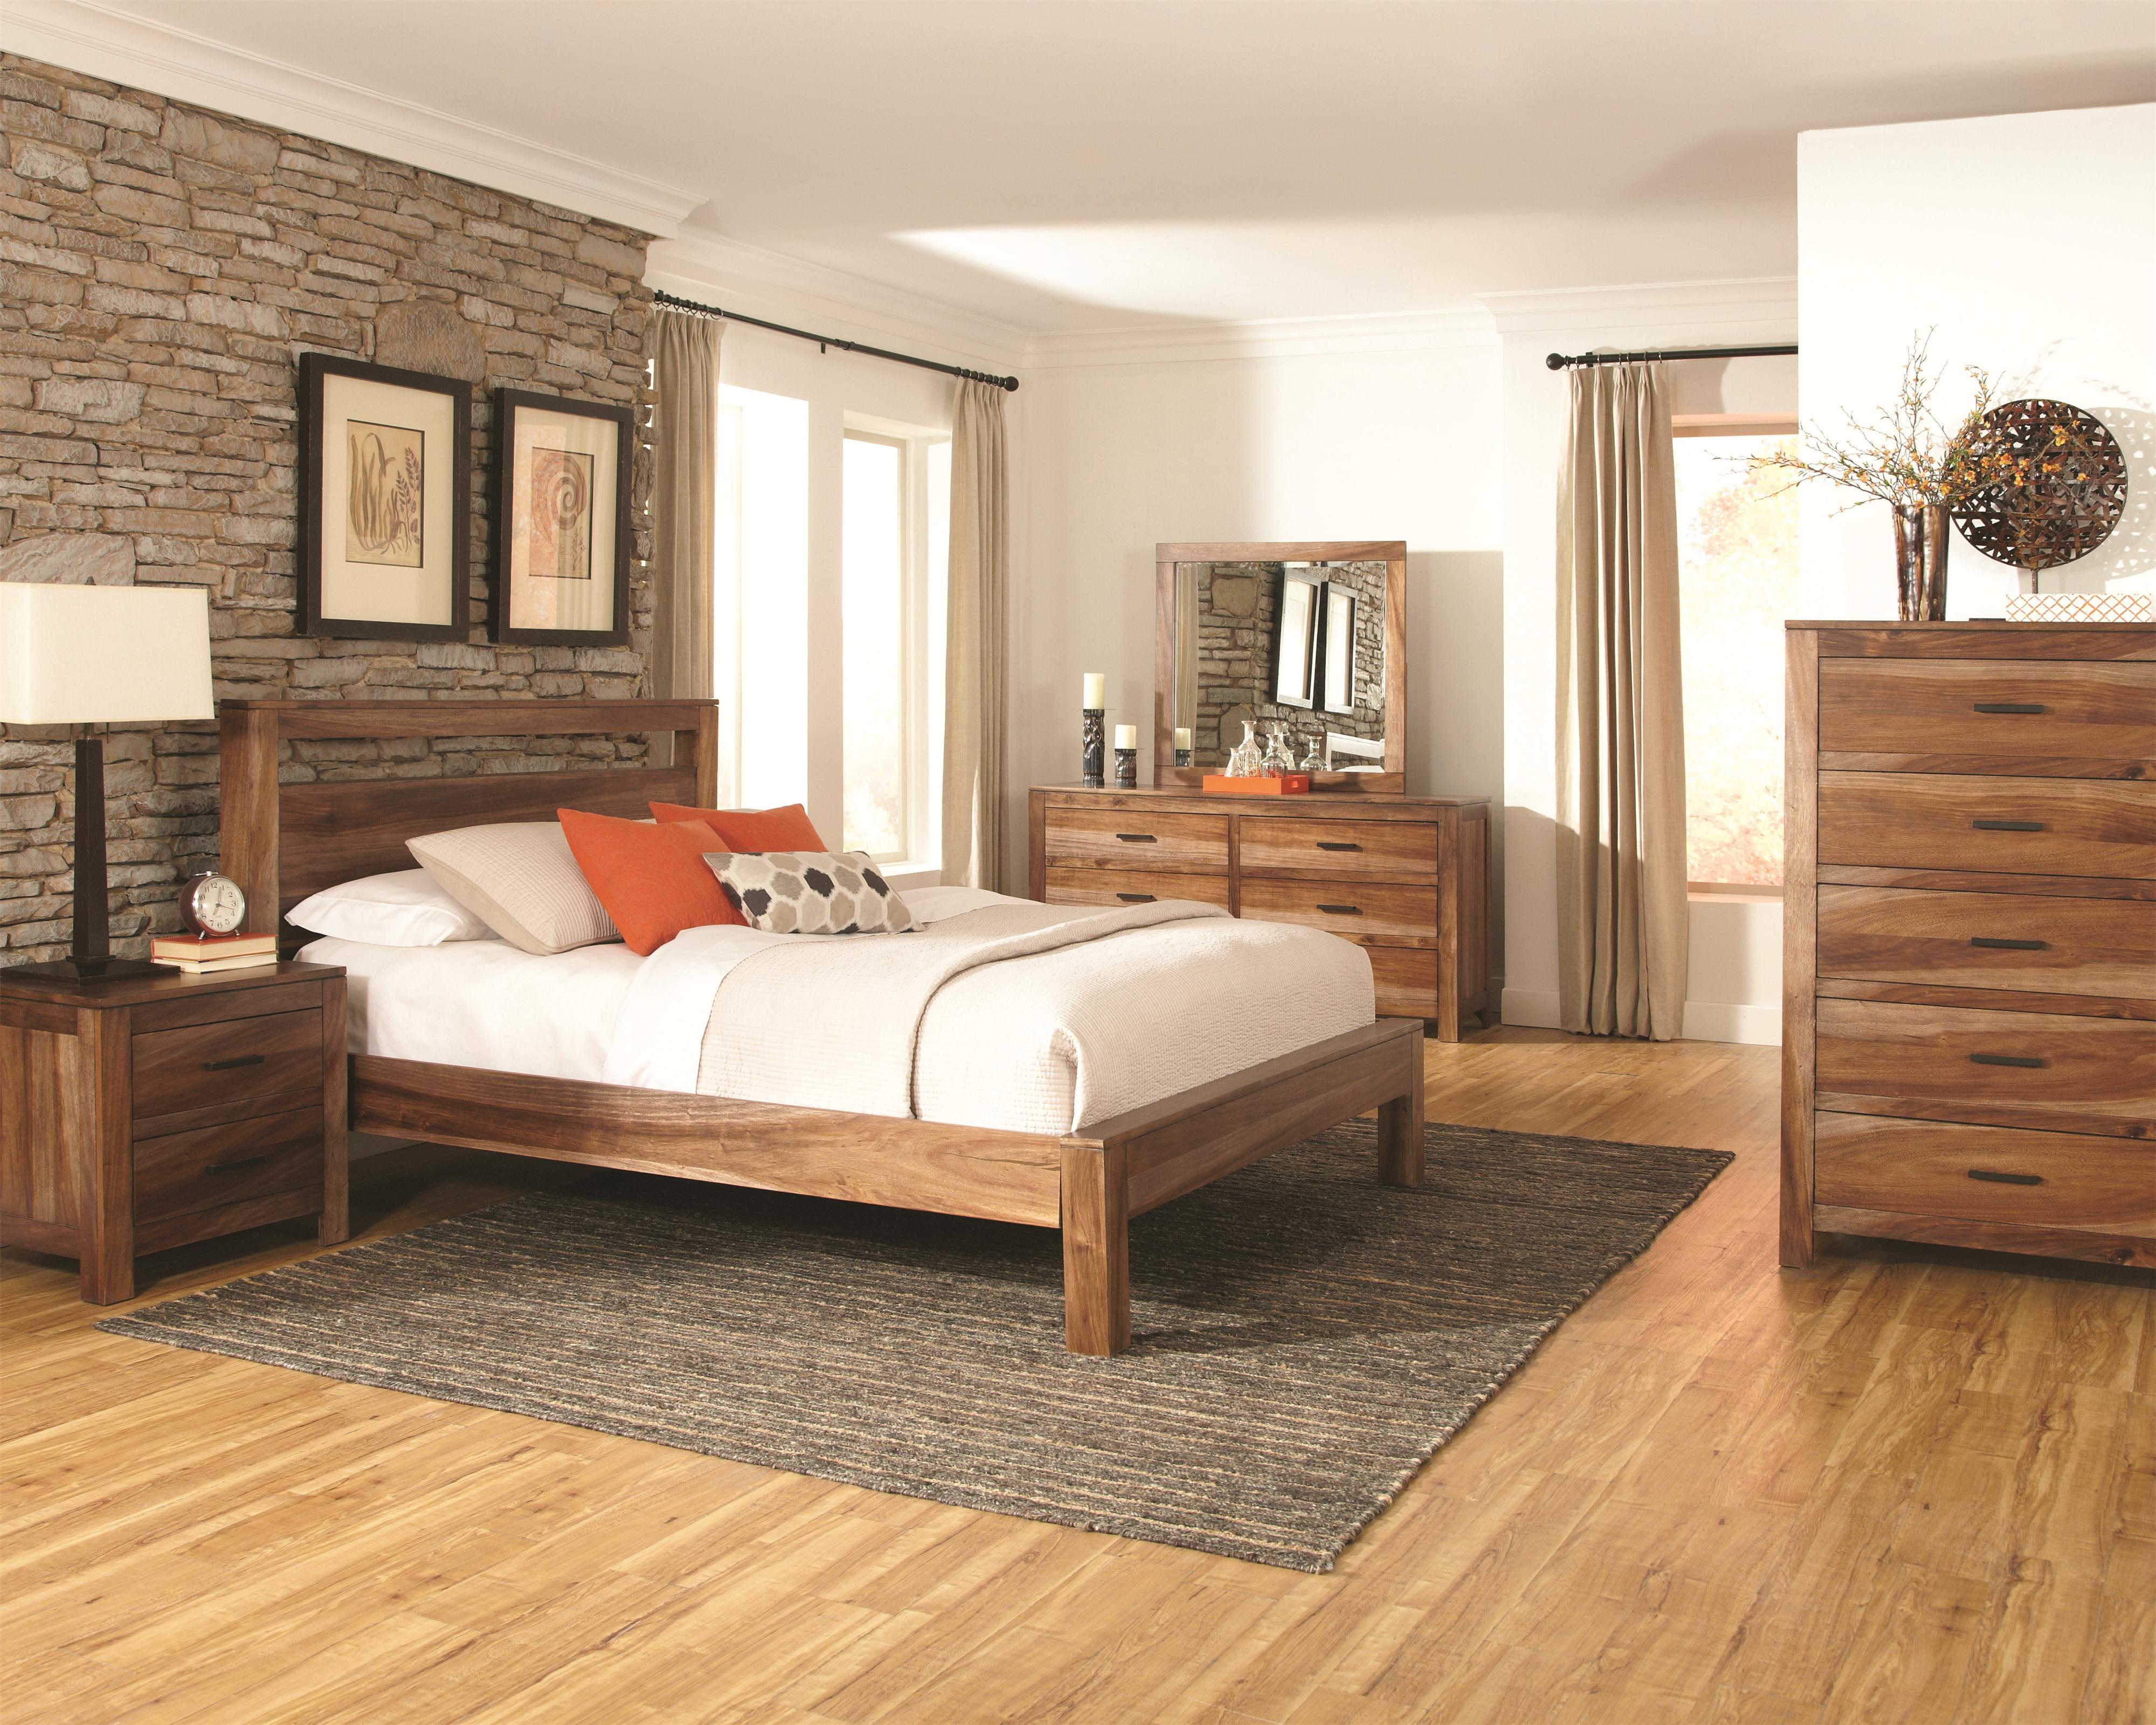 Coaster Peyton Queen Bedroom Group - Item Number: 20365 Q Bedroom Group 1